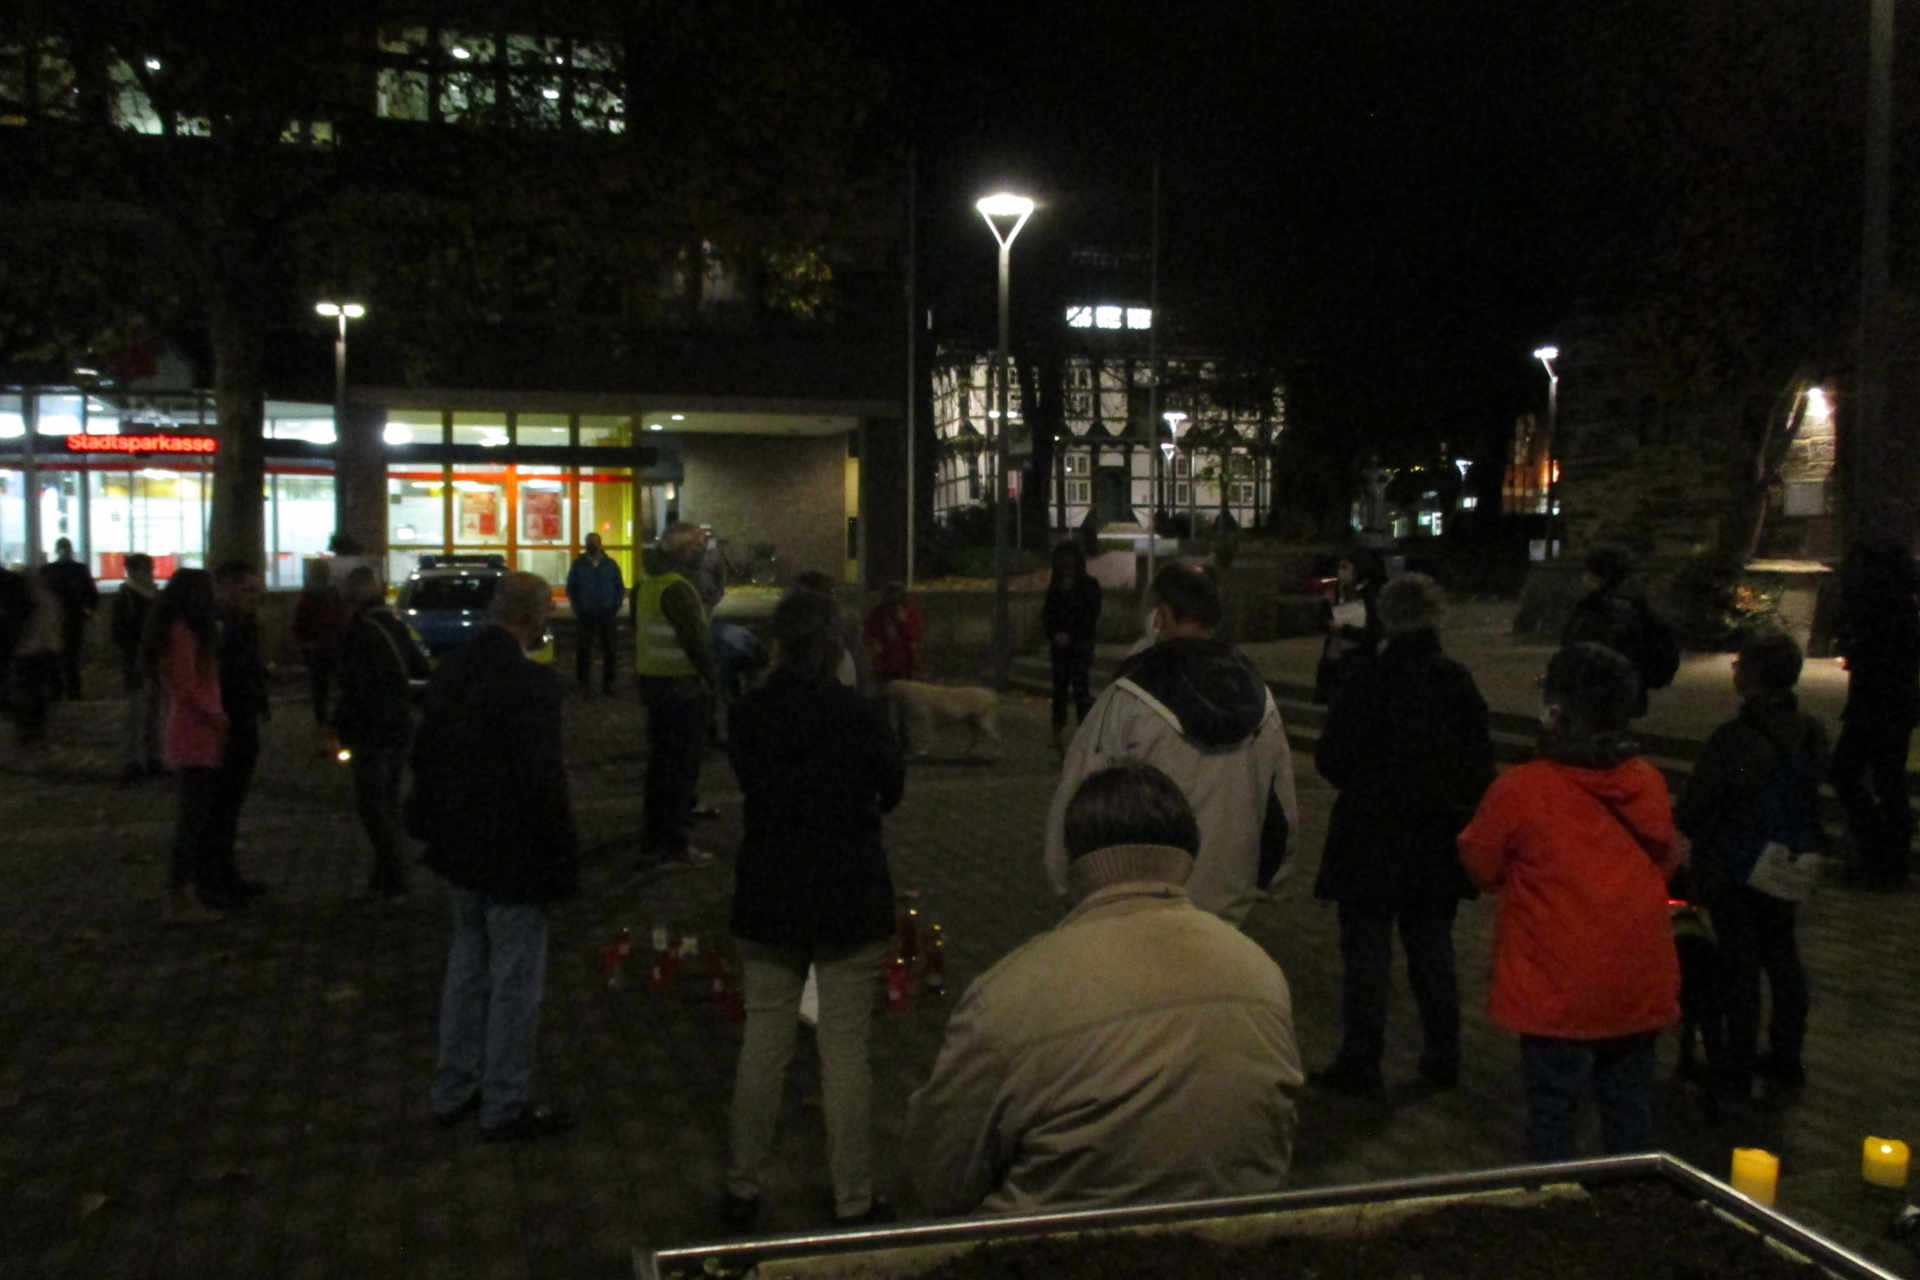 Bild von Anti-Coronamaßnahmen-Demo in Wunstorf